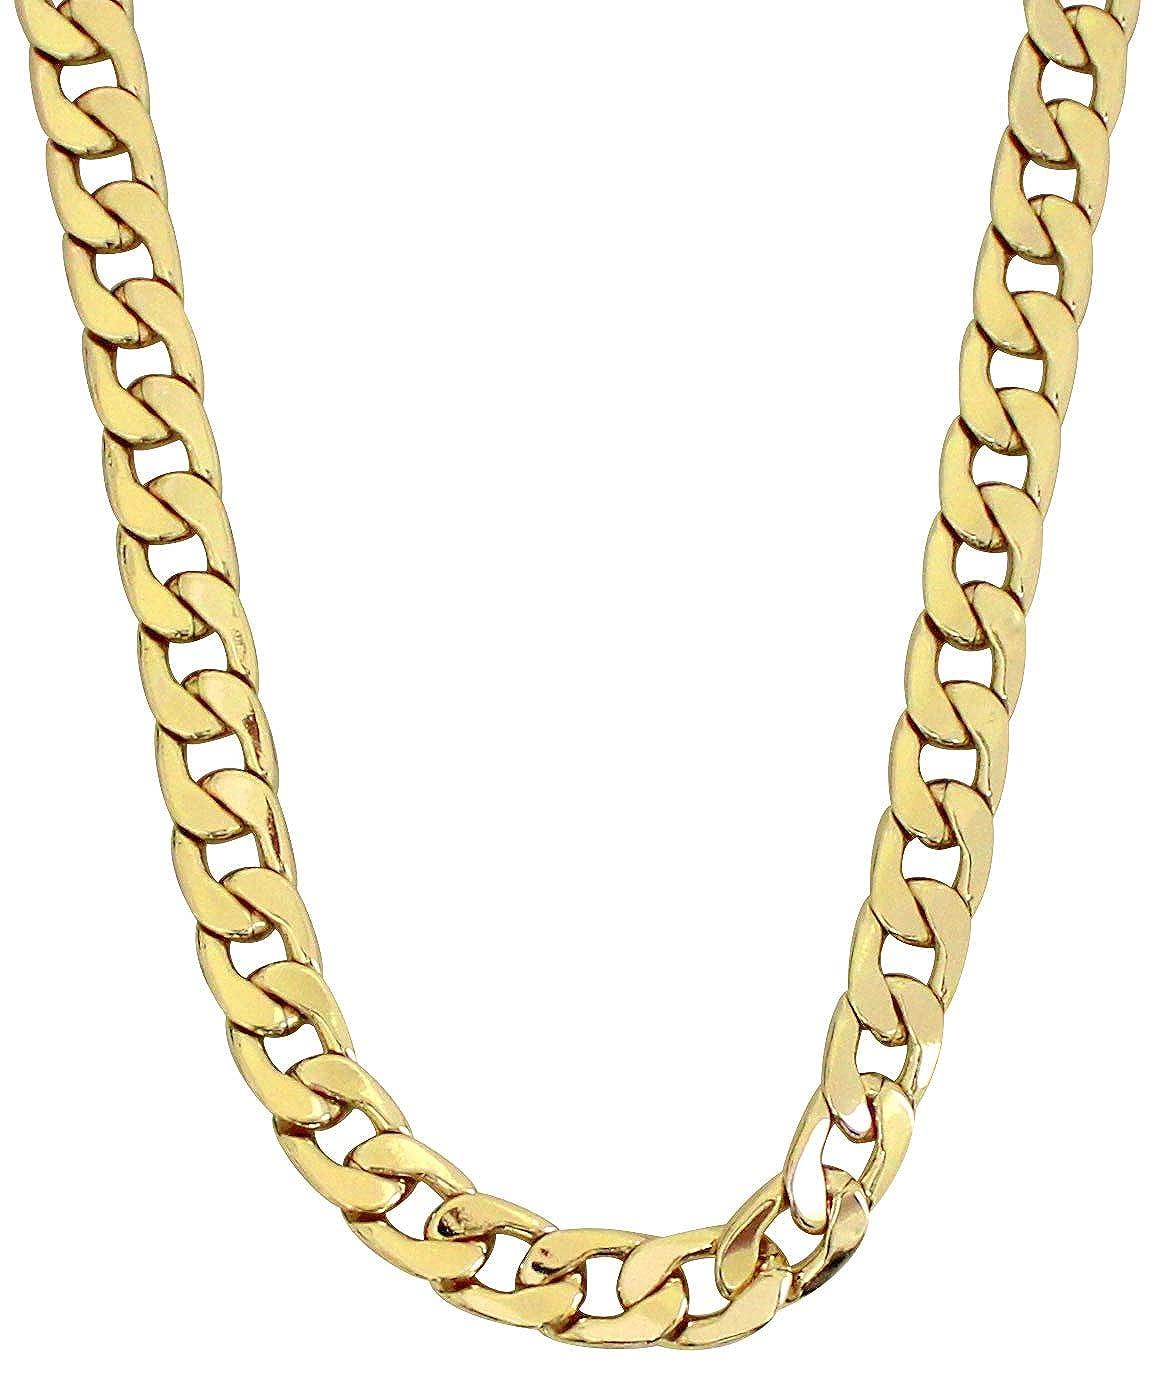 d90d35fc92c1e NewAgeBling Mens 14k Gold Plated Miami Cuban Link 7mm 9mm 12mm Necklace  16